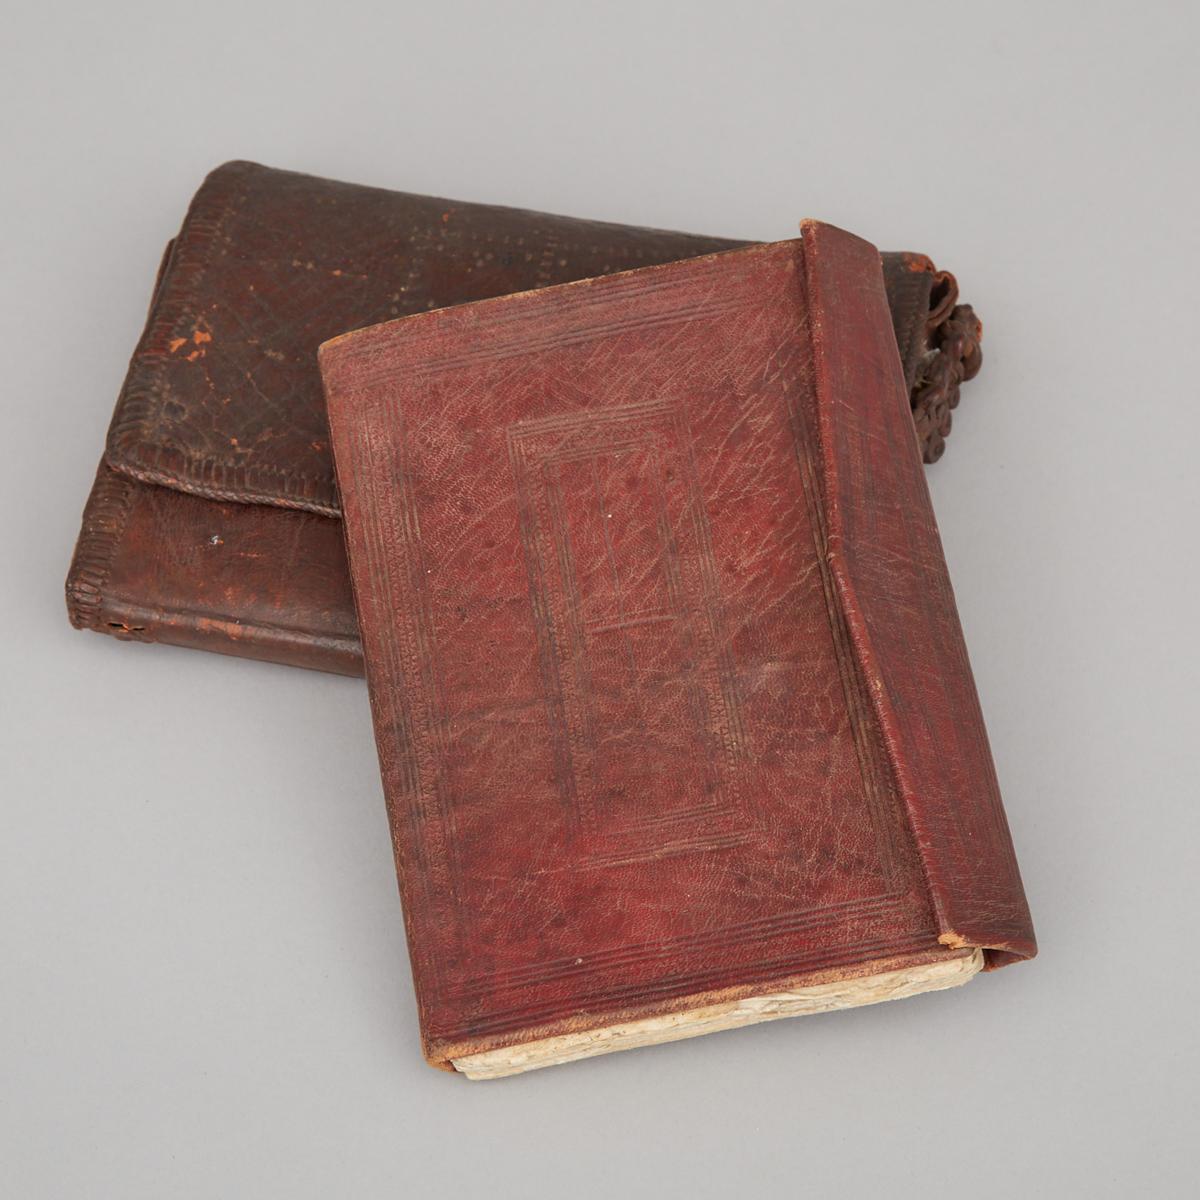 Islamic Prayer Manuscript, 19th century, 7 x 5.5 in — 17.8 x 14 cm - Image 2 of 6